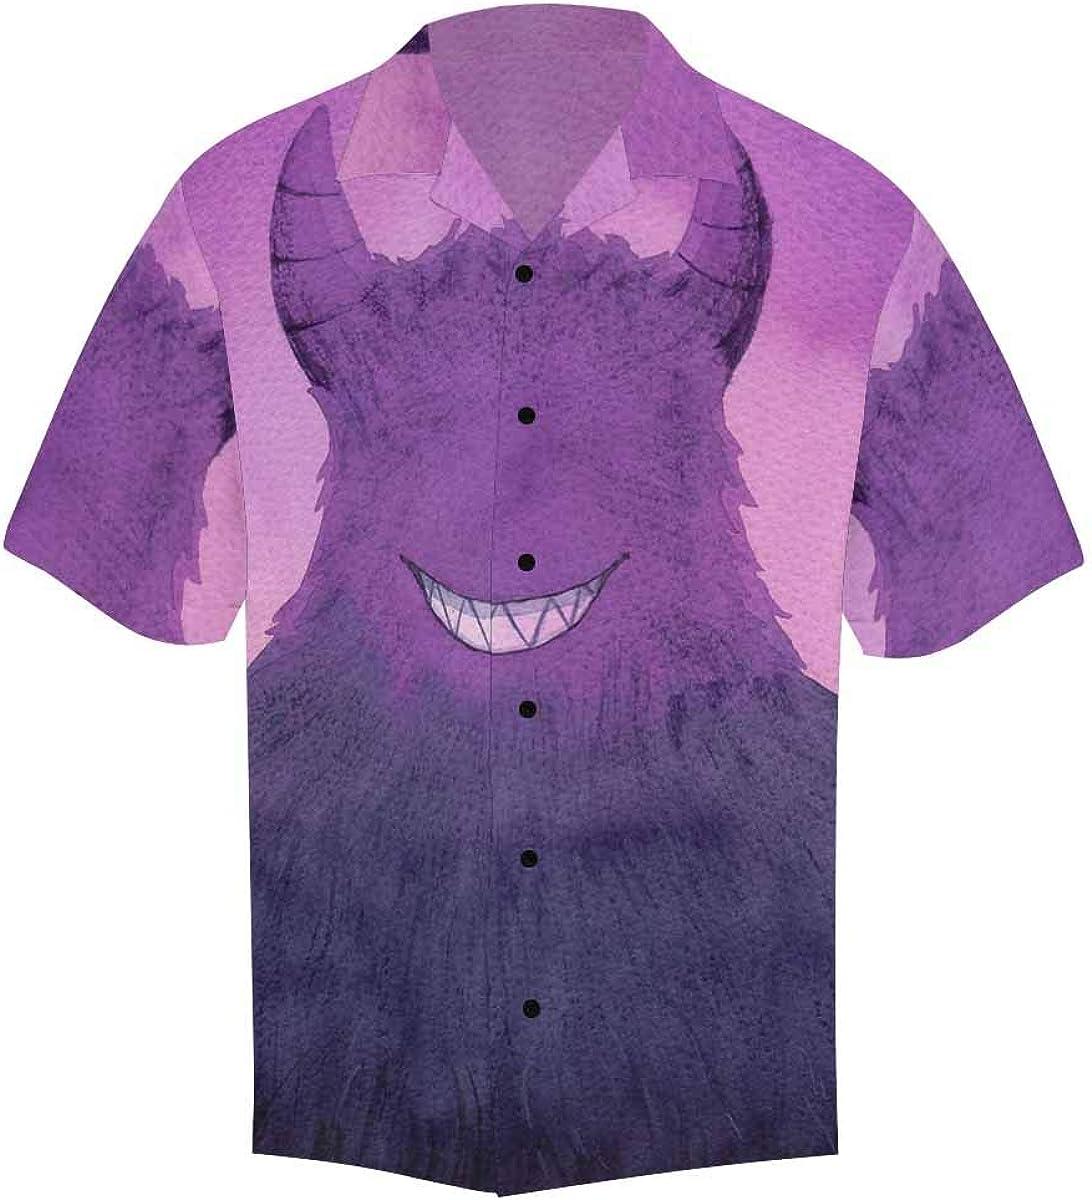 InterestPrint Men's Casual Button Down Short Sleeve Creepy Monster Smiles Vampire Hawaiian Shirt (S-5XL)